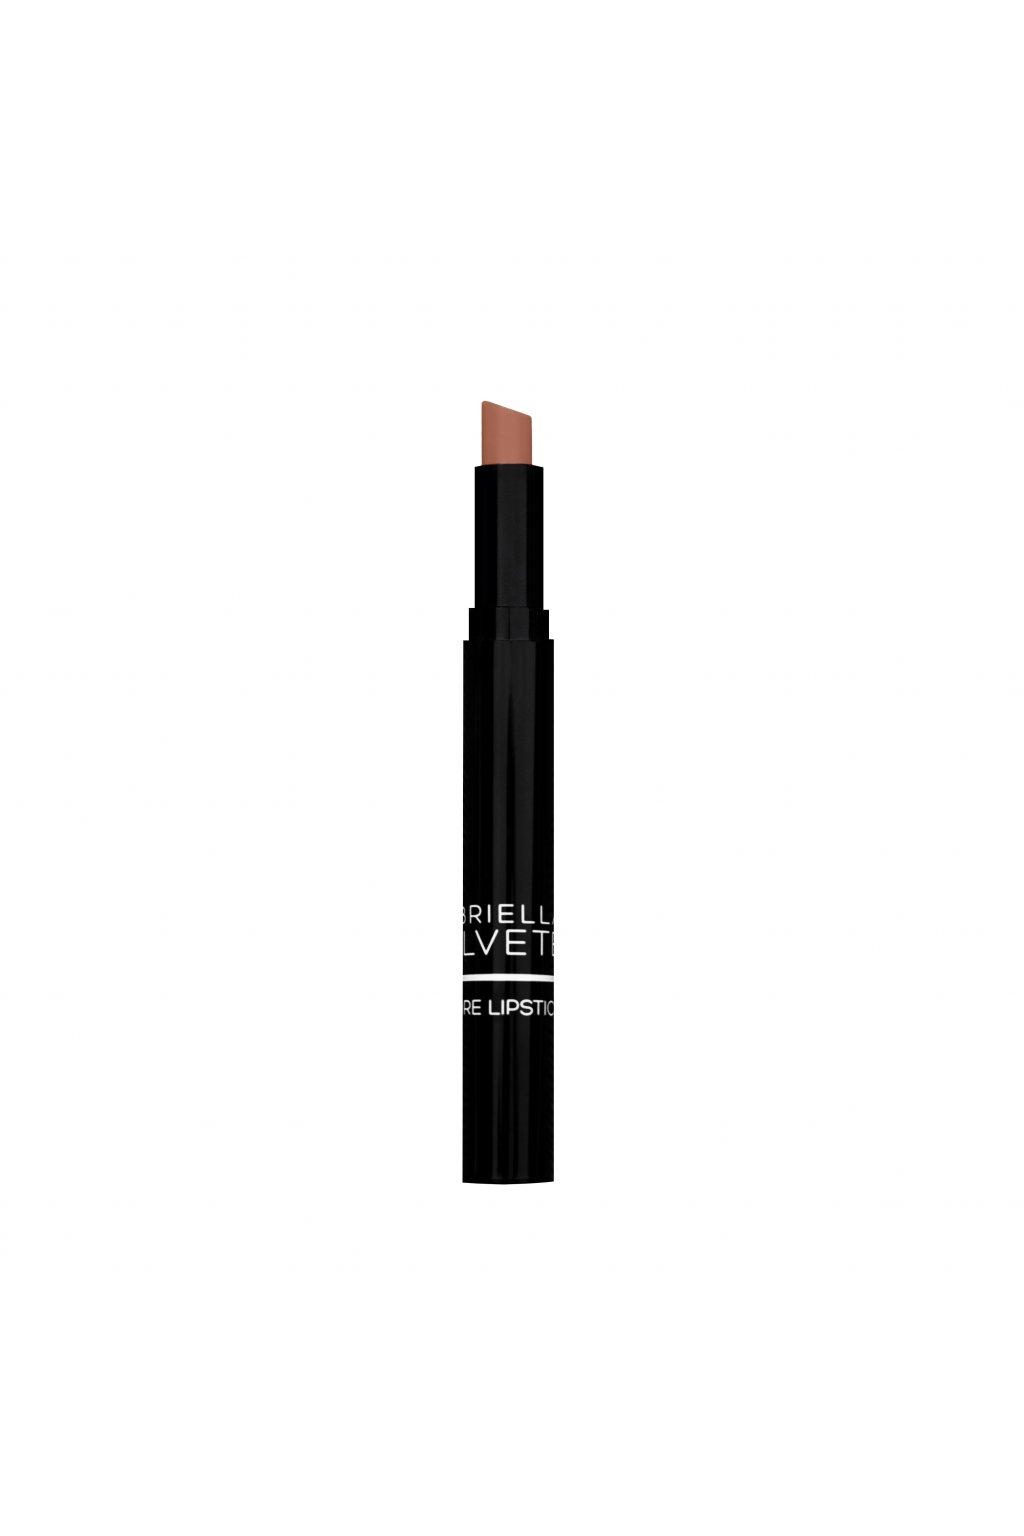 gabriella salvete colore lipstick rtenka pro zeny 2 5 g odstin 01